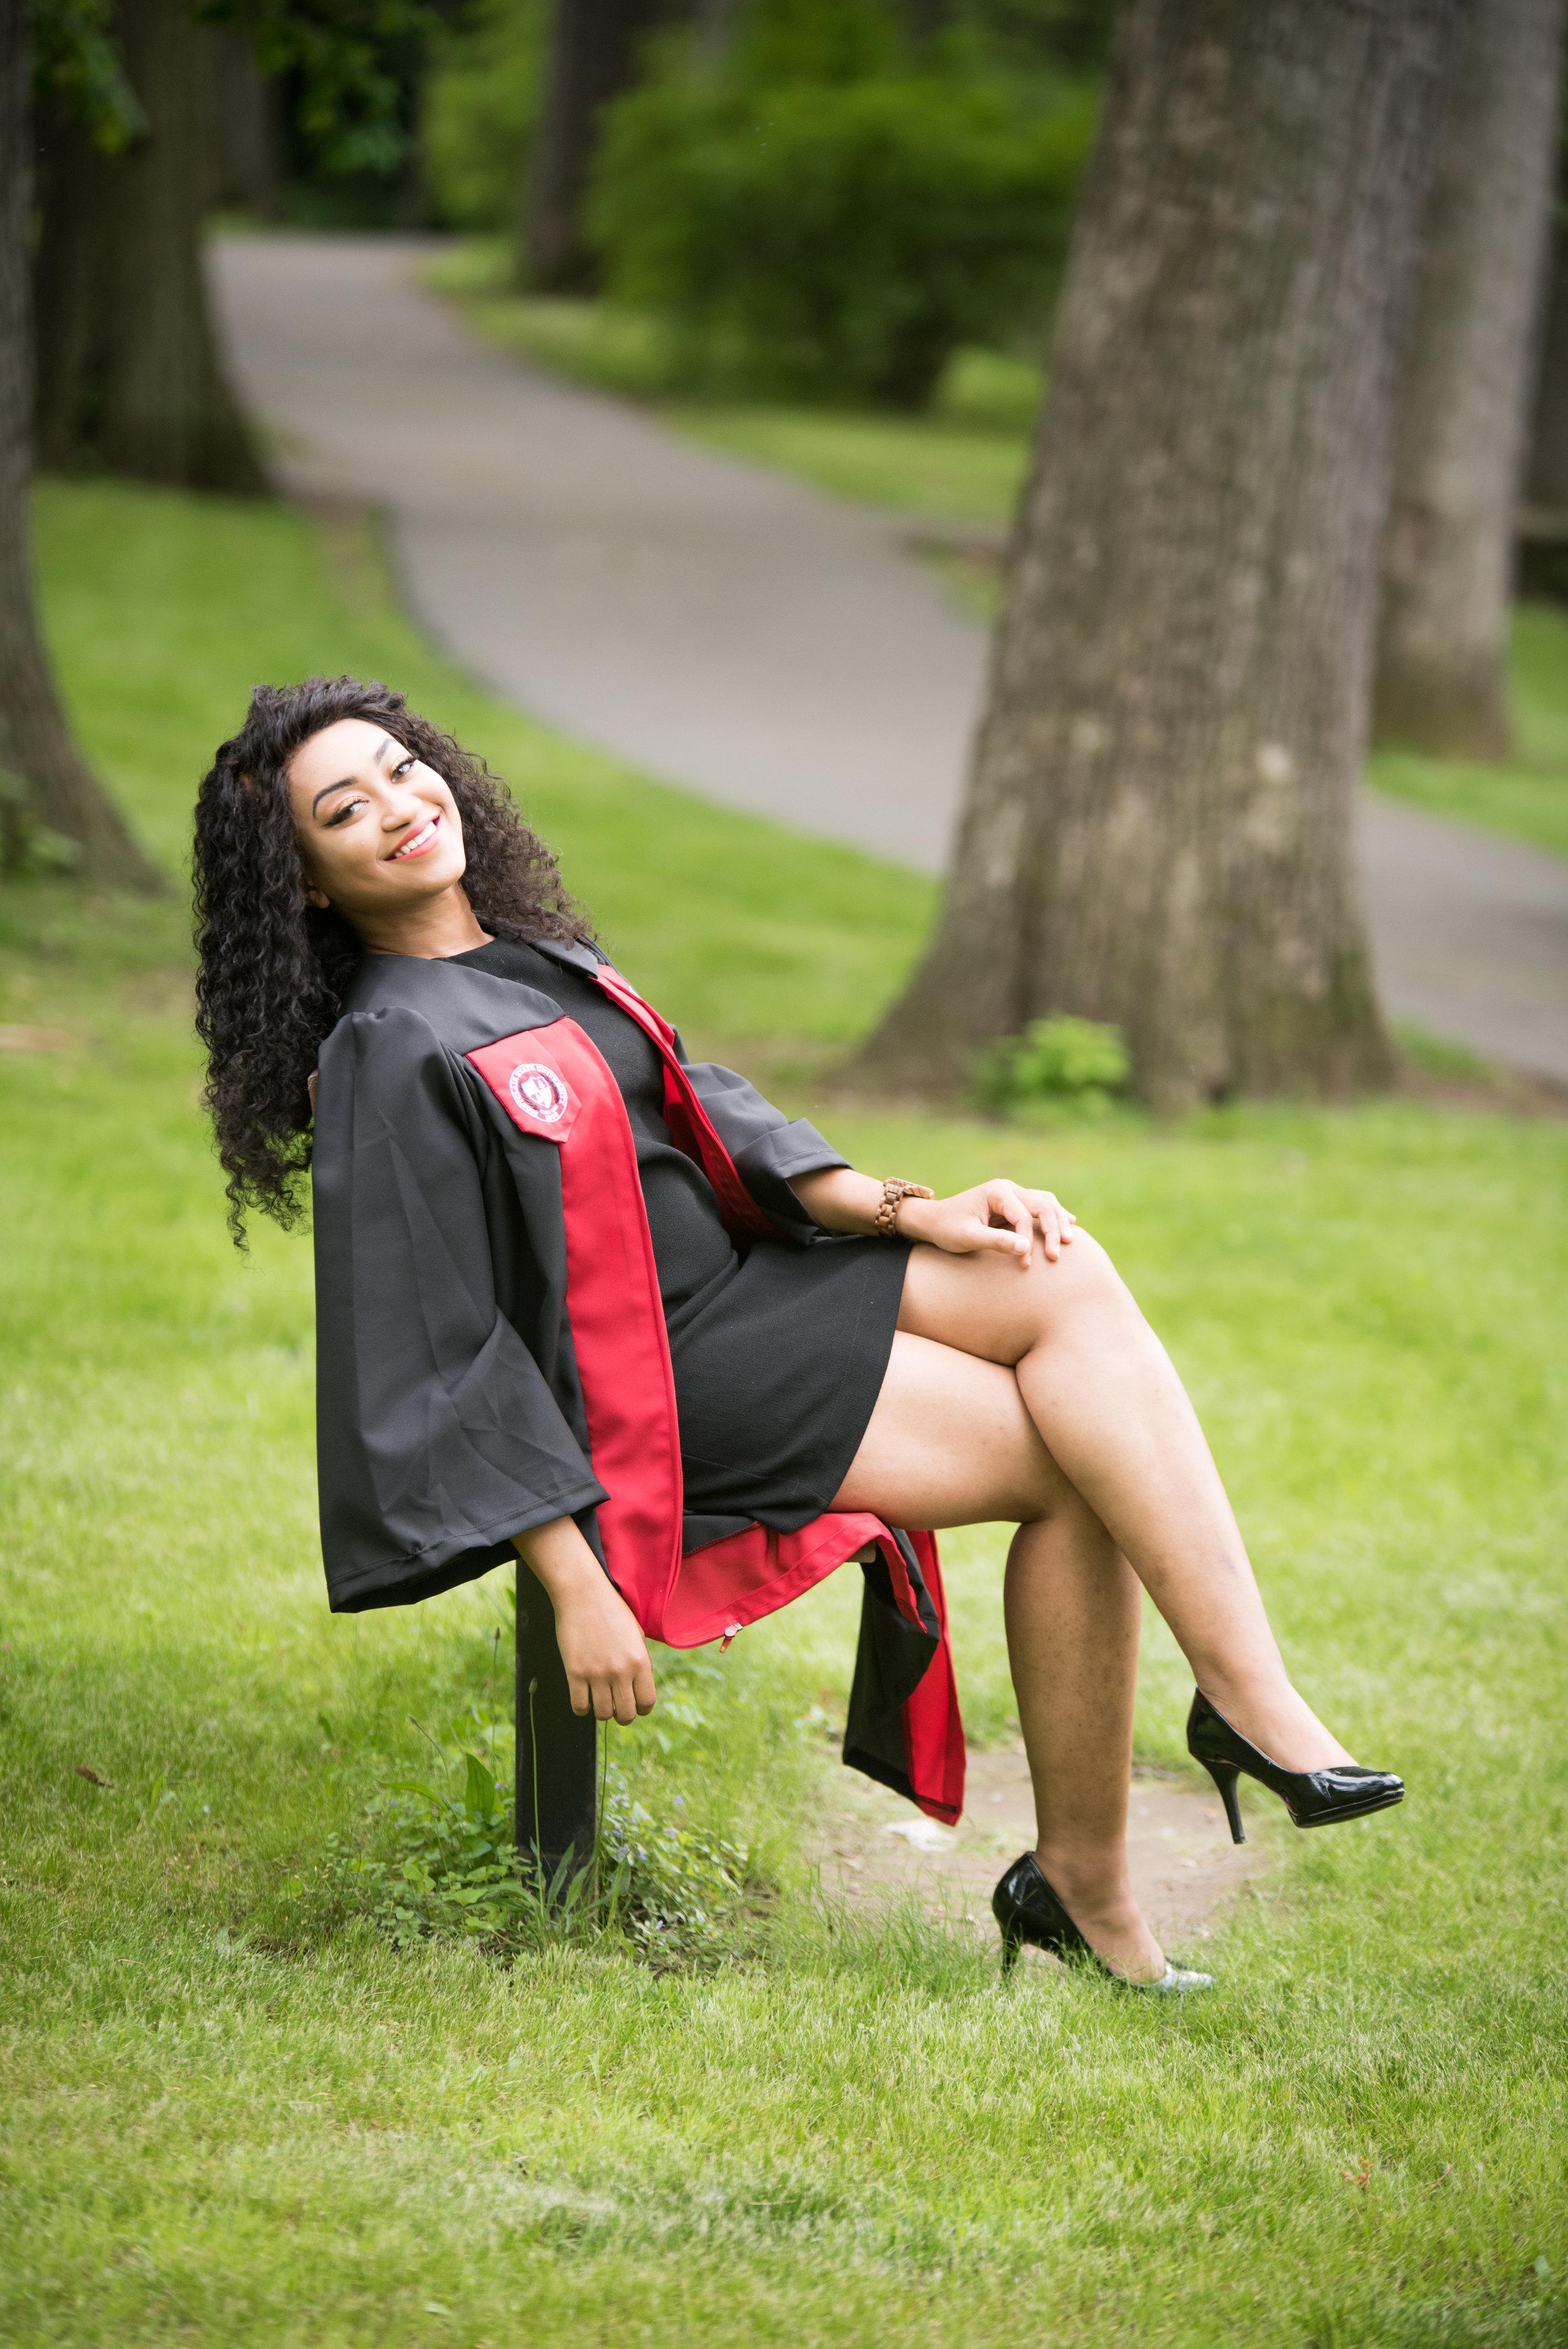 College Graduate - 📸Blackhill Photography